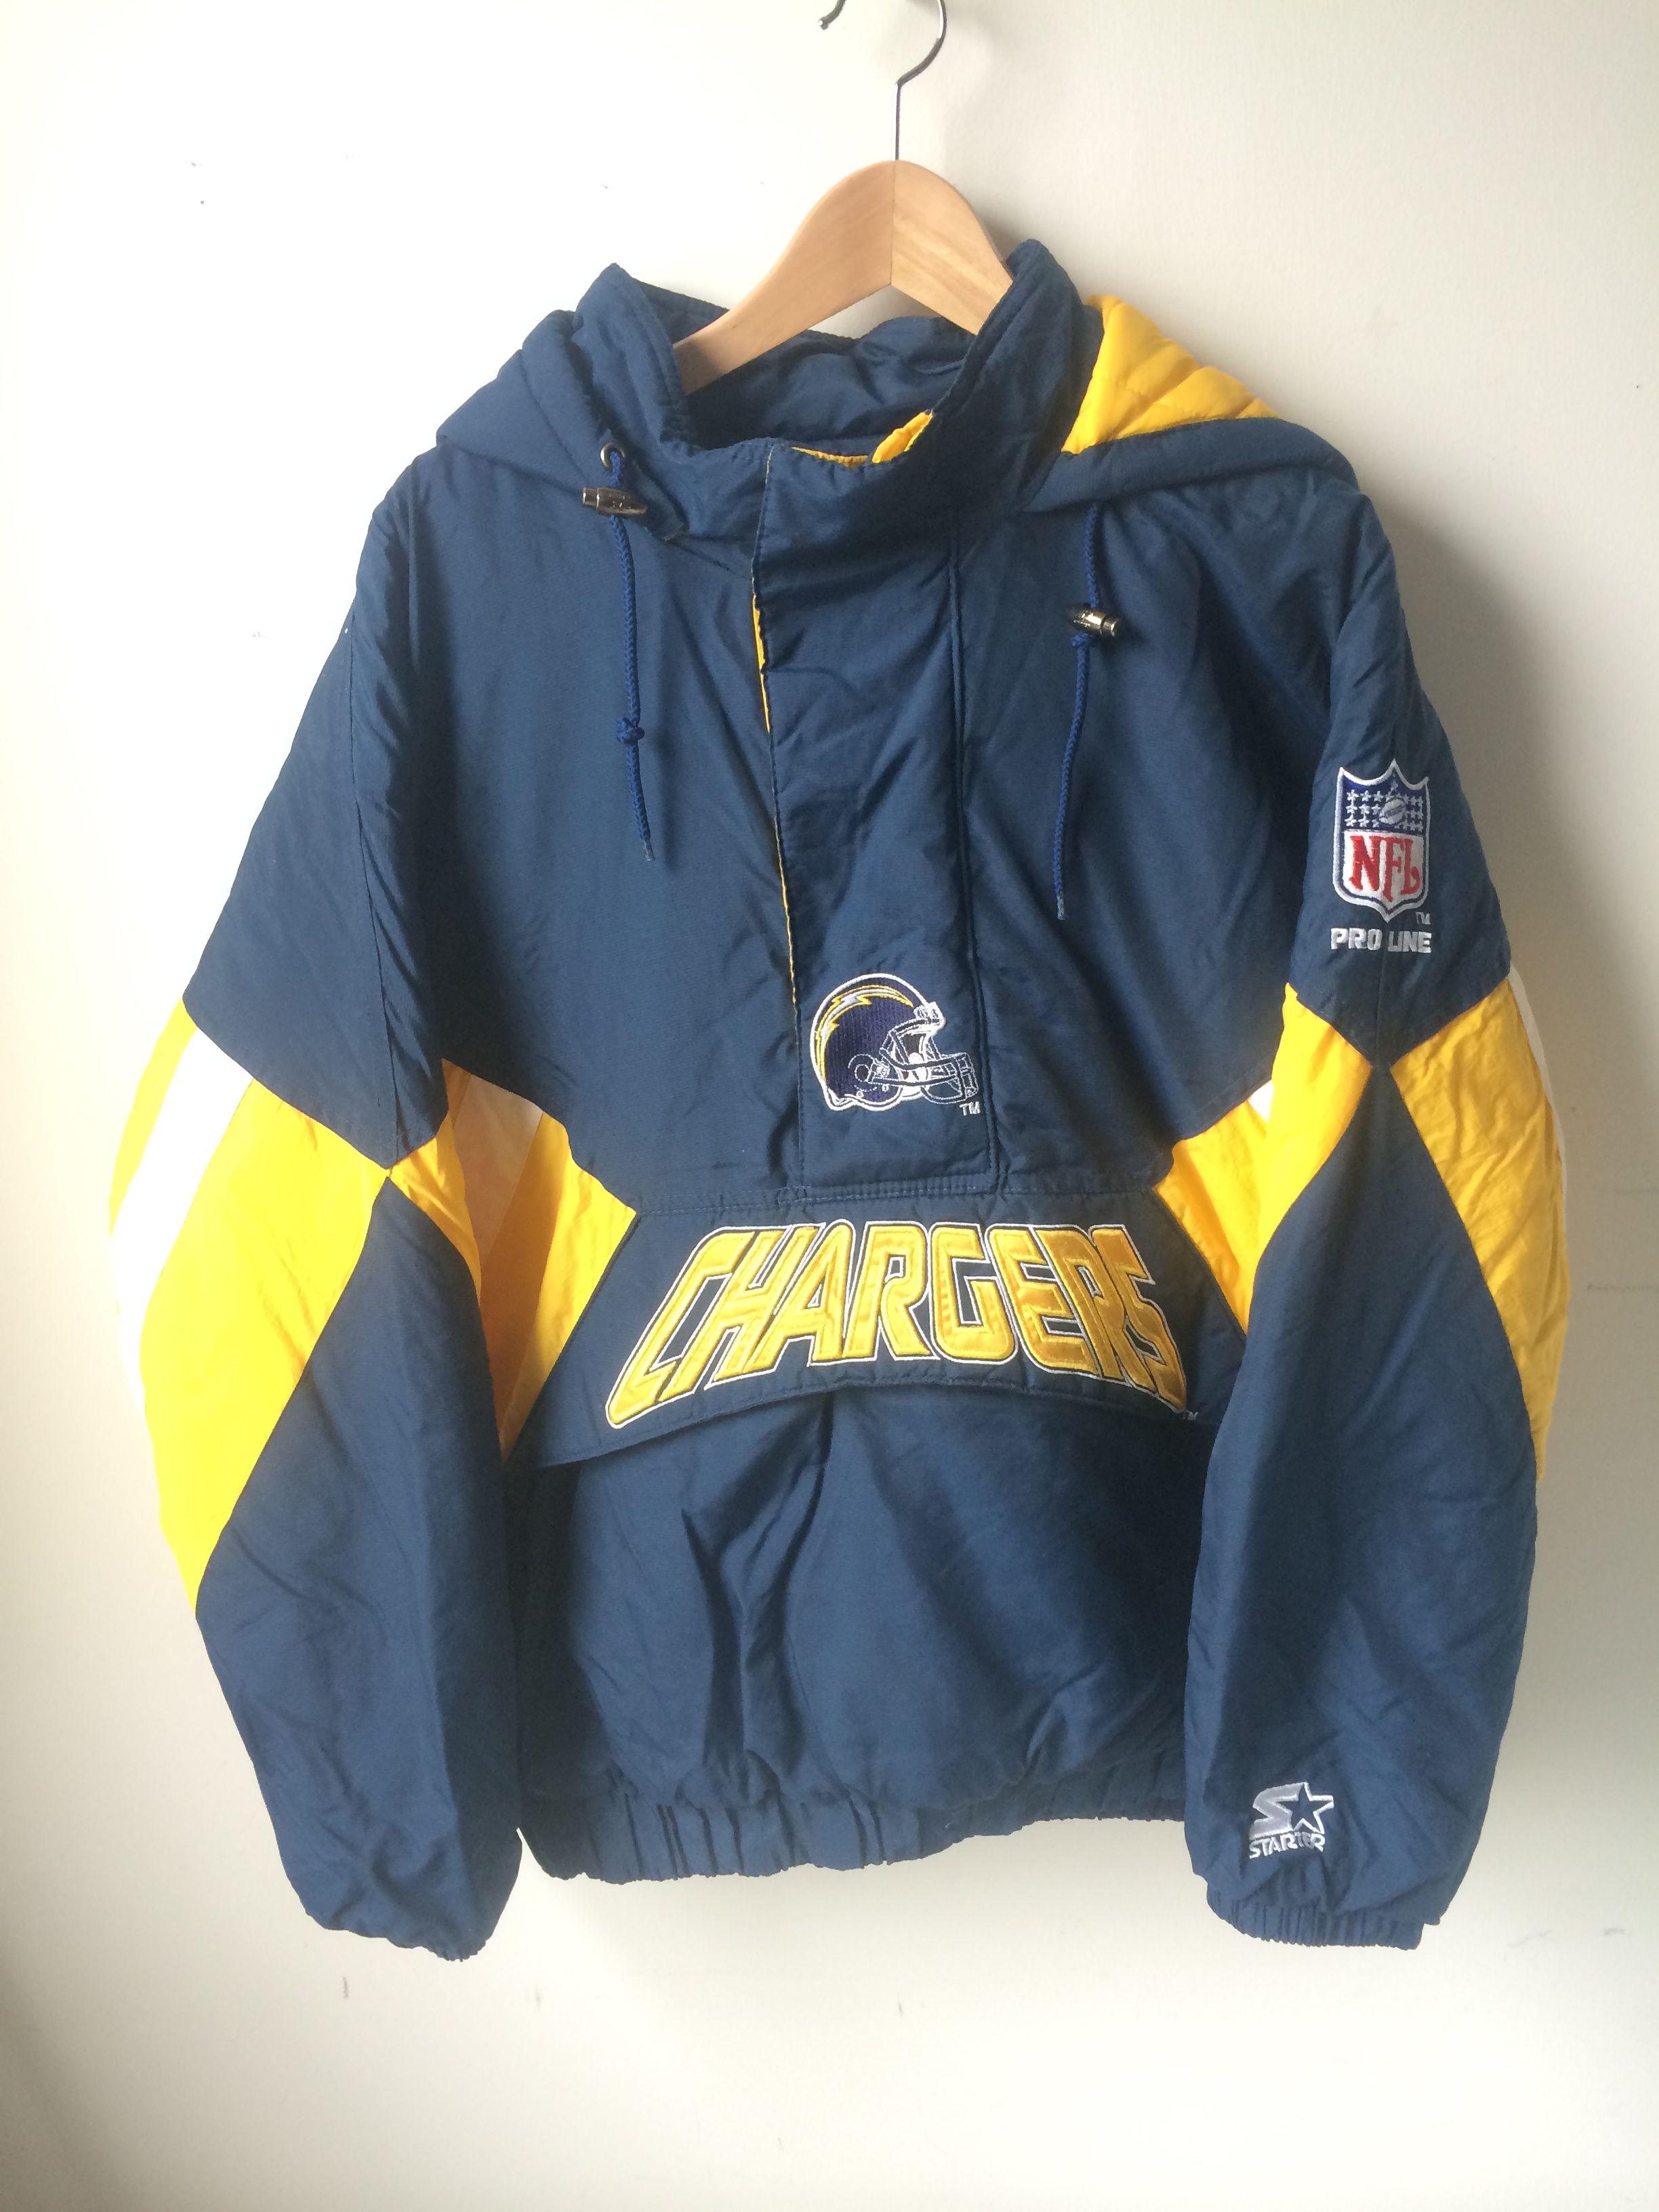 the best attitude 5cd54 406da Starter Jacket San Diego Chargers | Fresh Threads | Jackets ...